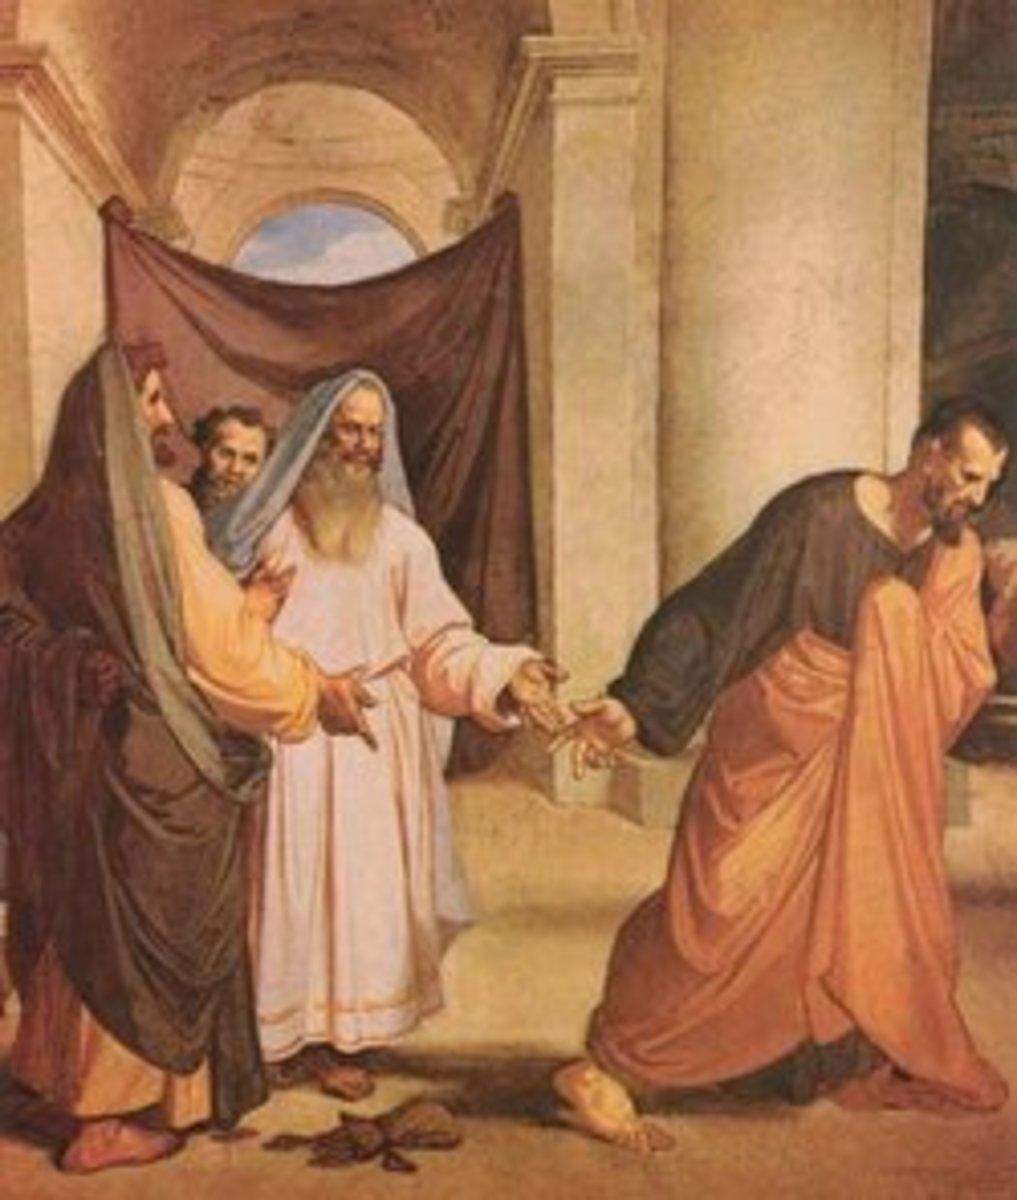 judas-the-misunderstood-disciple